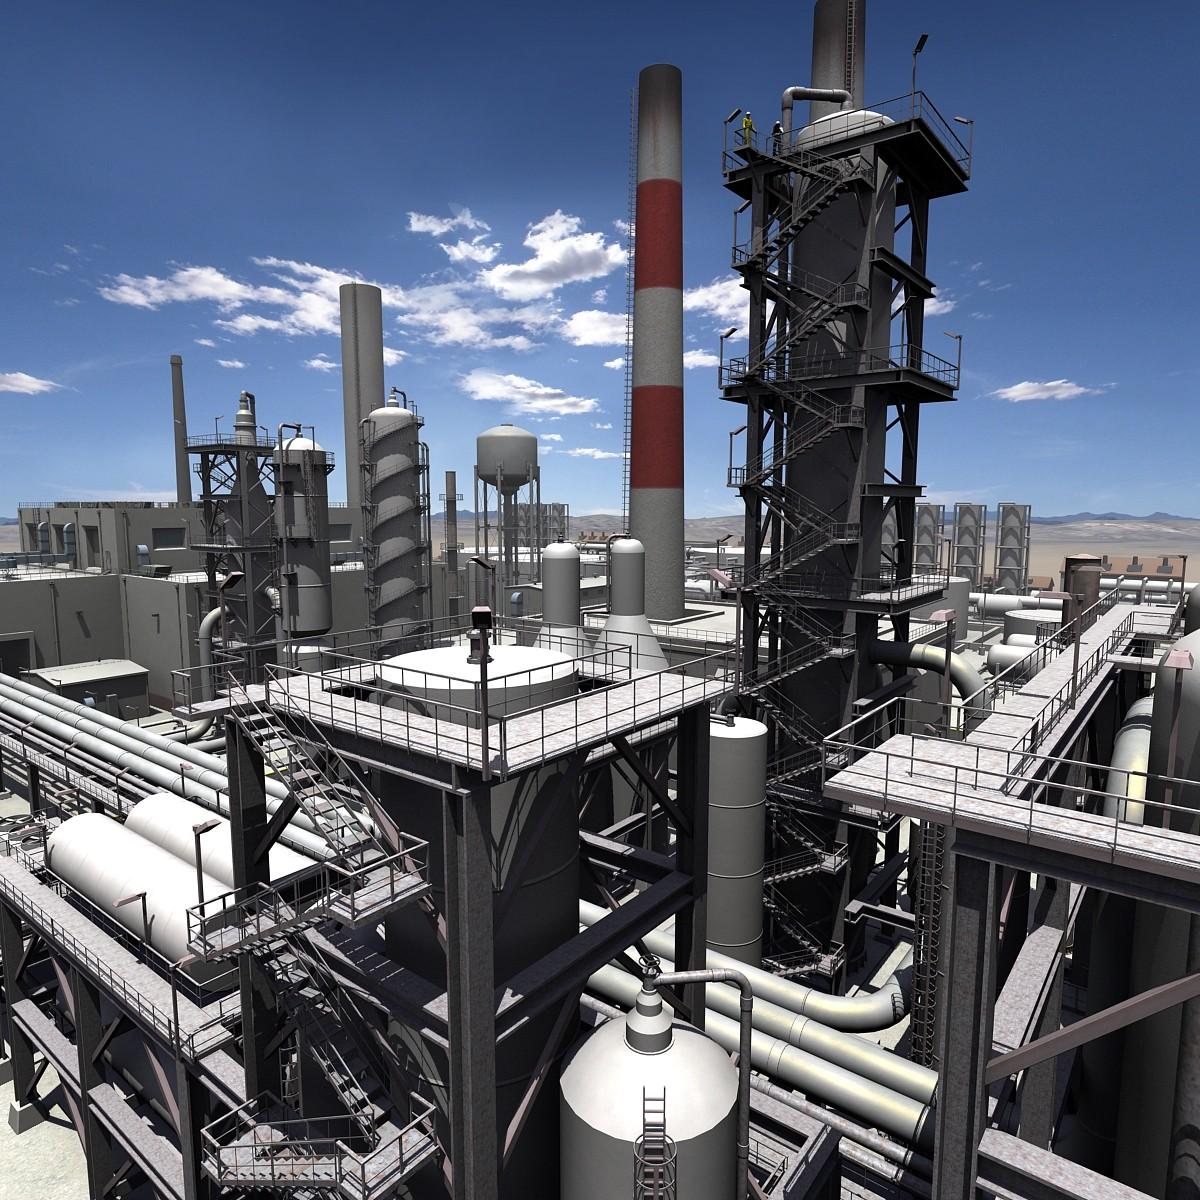 refinery1_01f_1200x1200.jpg